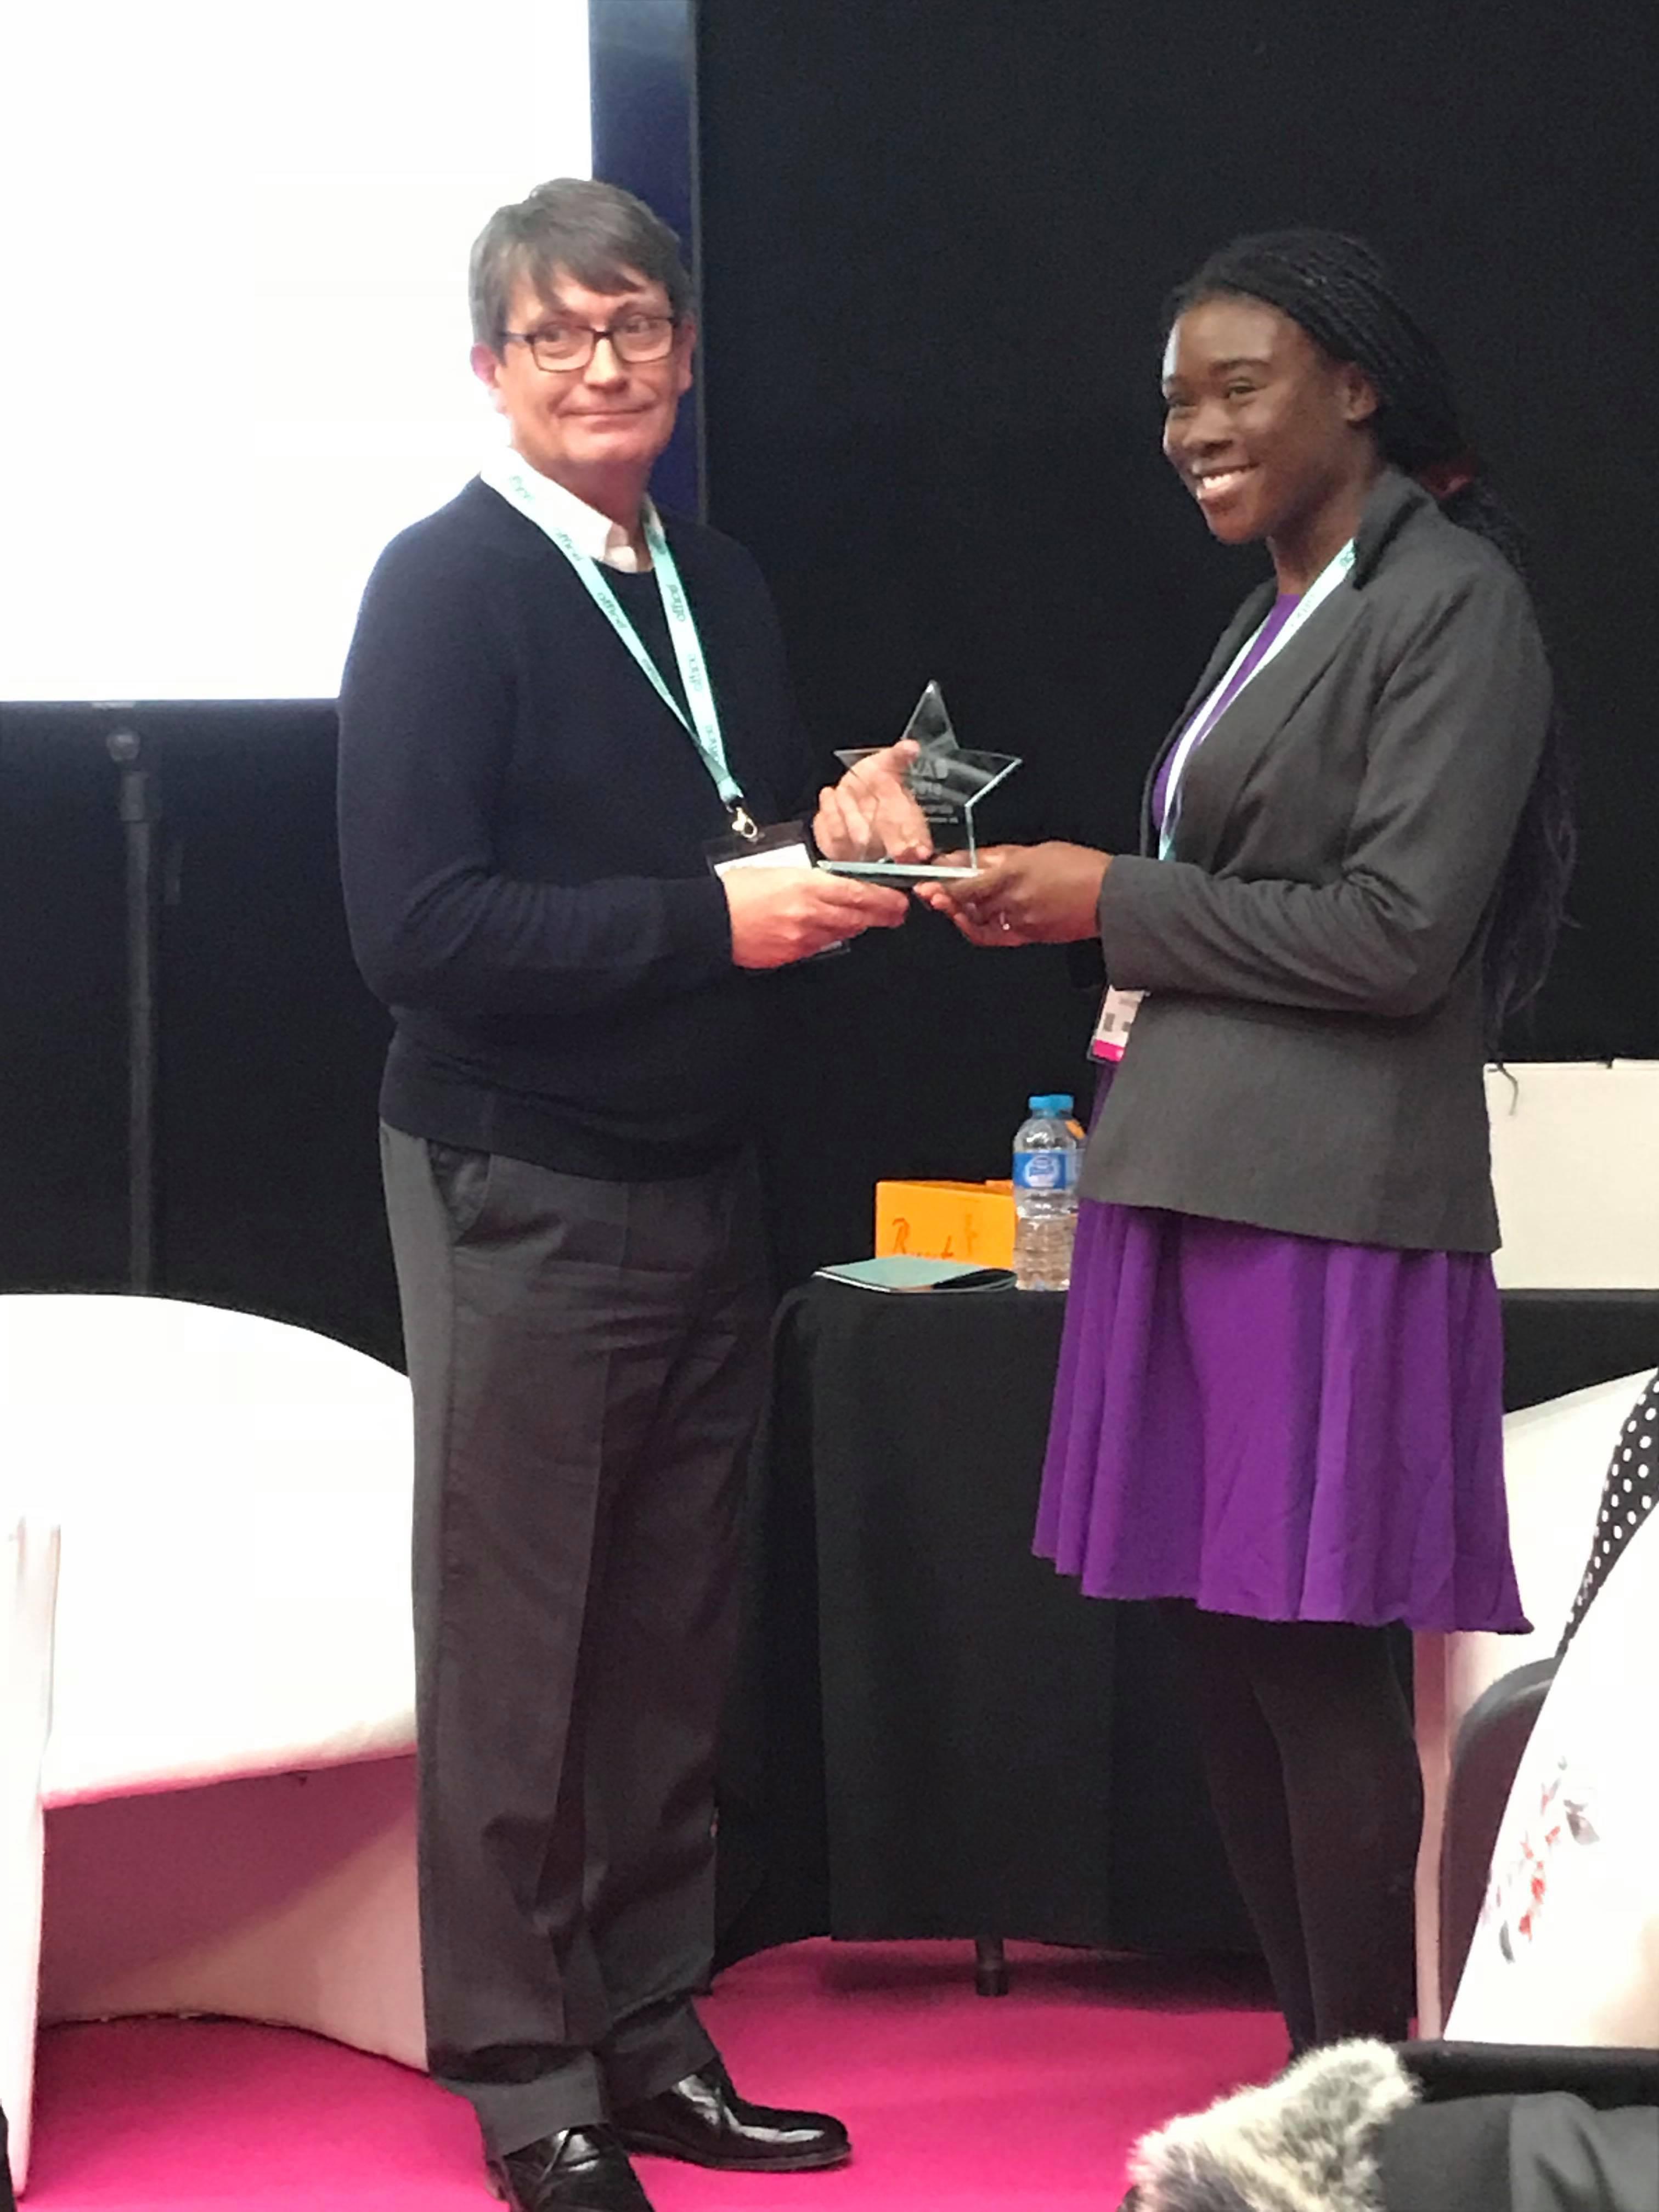 Toks Adebanjo Virtual Assistant UK Best Newcomer VA Award Winner 2018